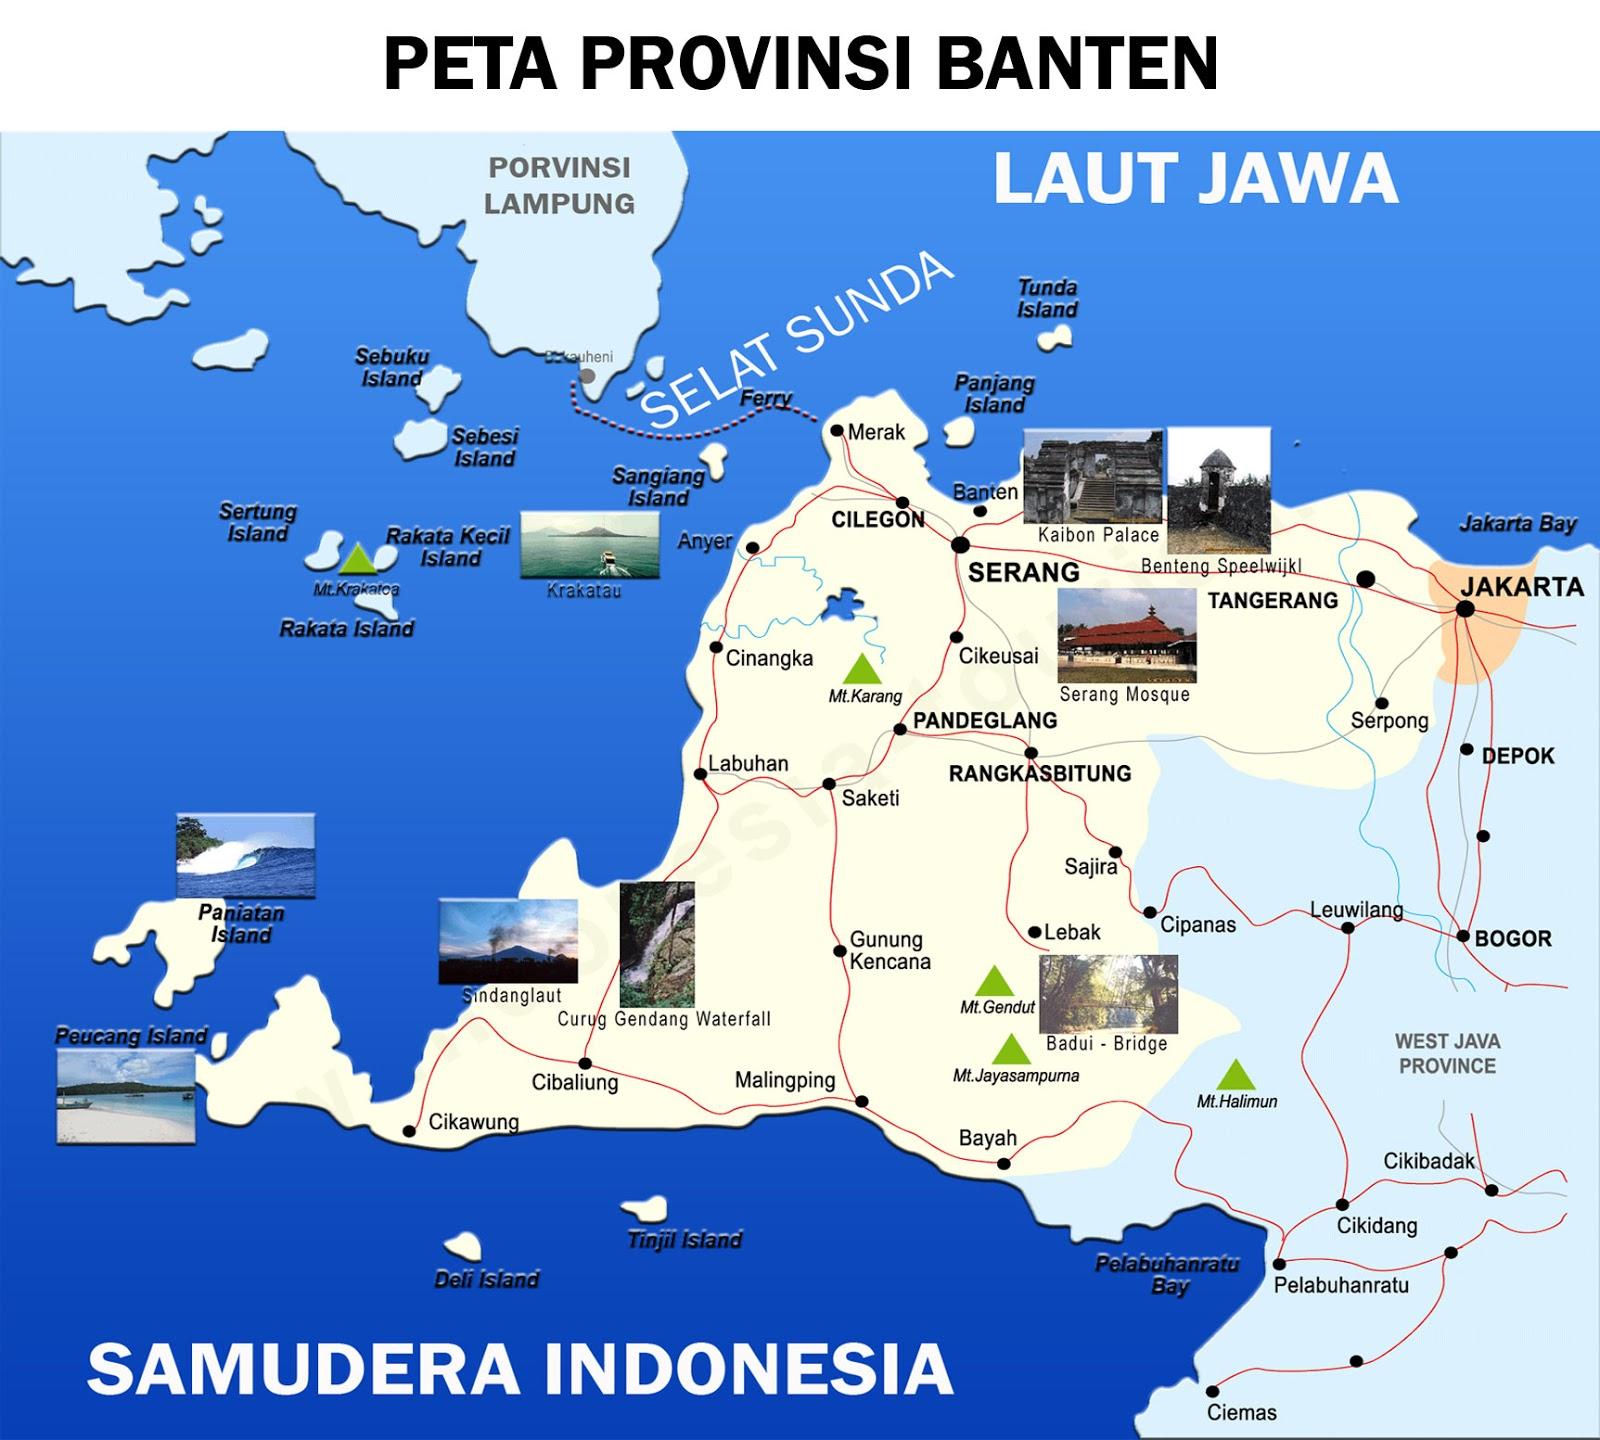 Peta-Banten-lengkap-4-Provinsi-dan-4-Kota